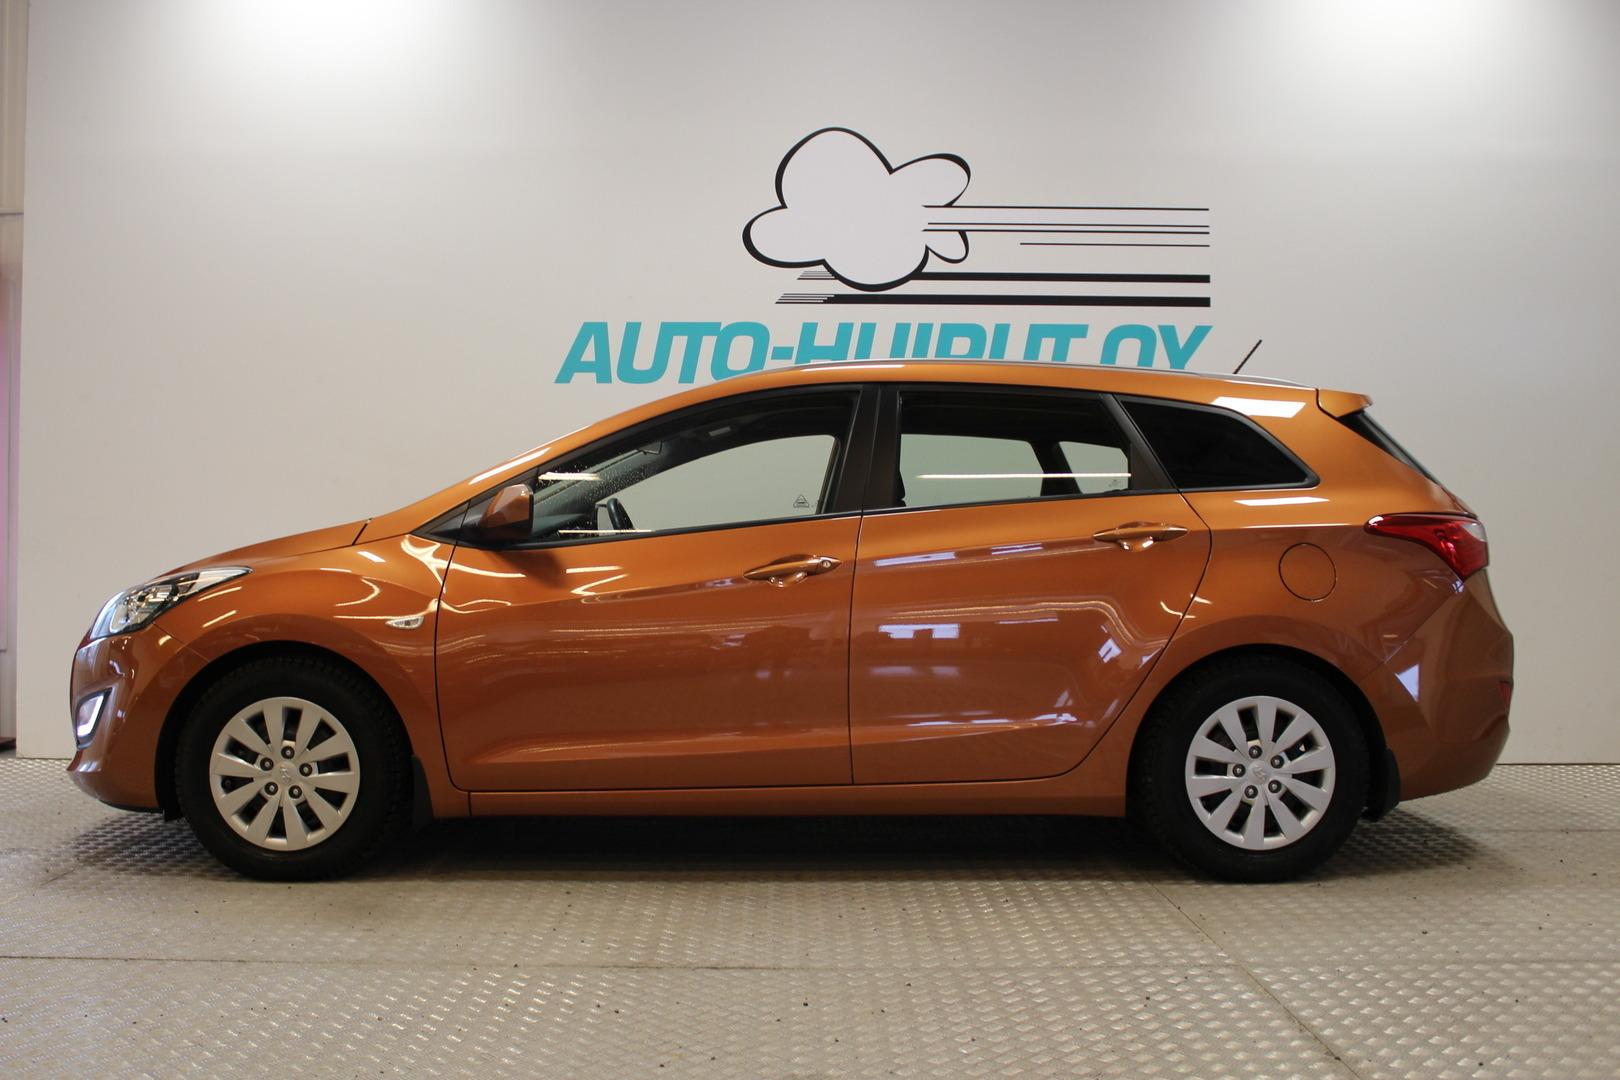 Hyundai i30 Wagon, 1,4 6MT ISG Classic #Vähän ajettu #Takuu #1-Omisteinen